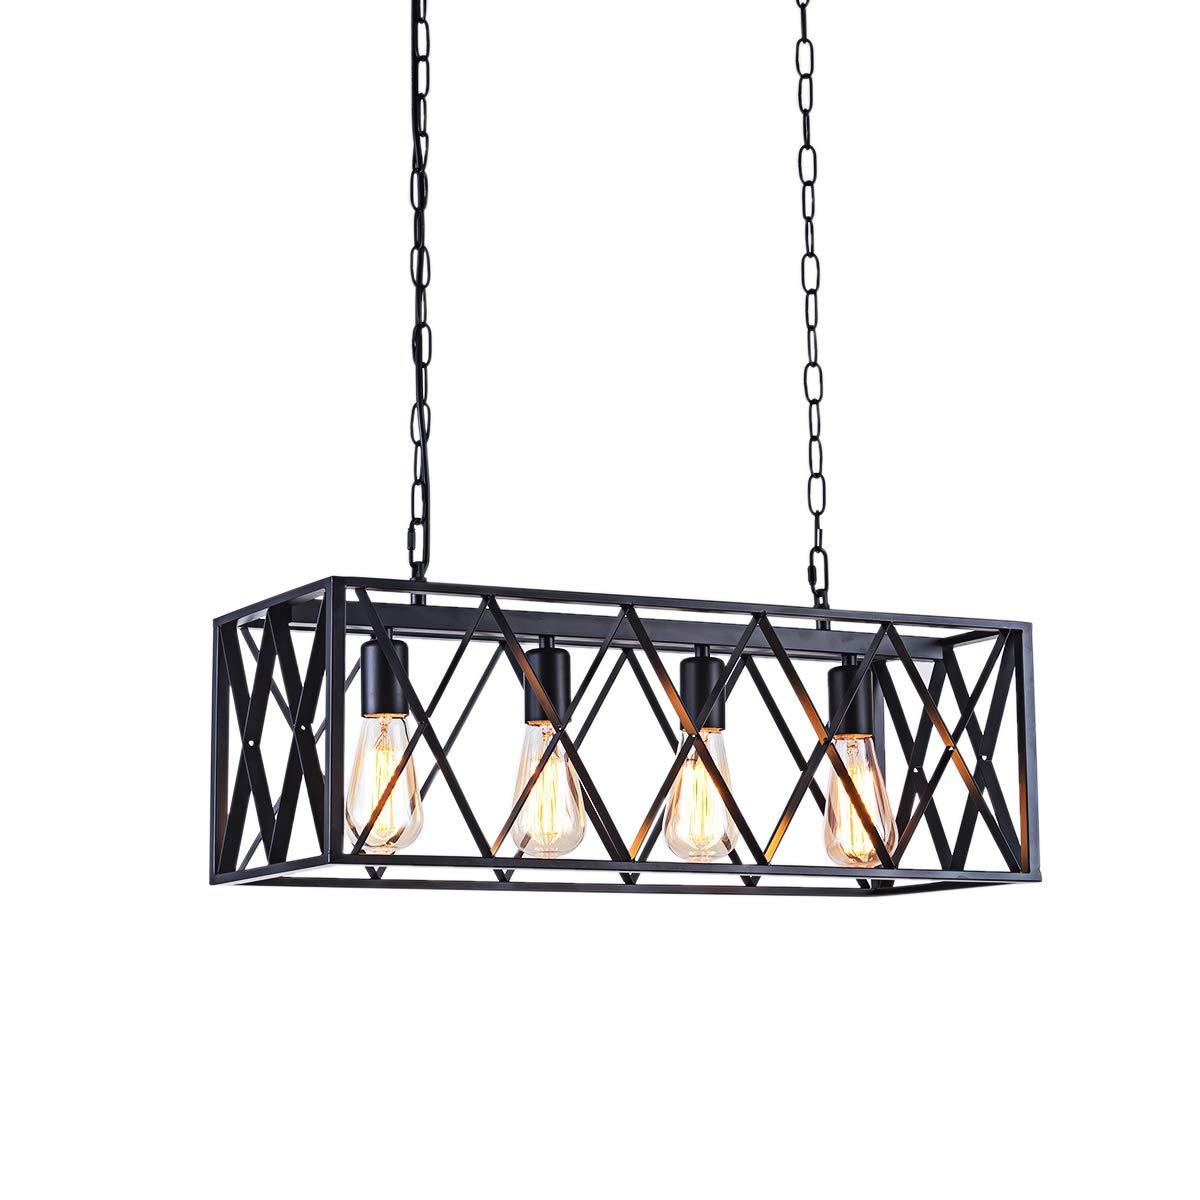 Diborui Industrial Kitchen Island Lighting with 4 E26 Sockets, Rectangular Vintage Pendant Light, Farmhouse Hanging Ceiling Light Fixture Metal Retro Chandeliers for Restaurant, Kitchen and Bar, 60W